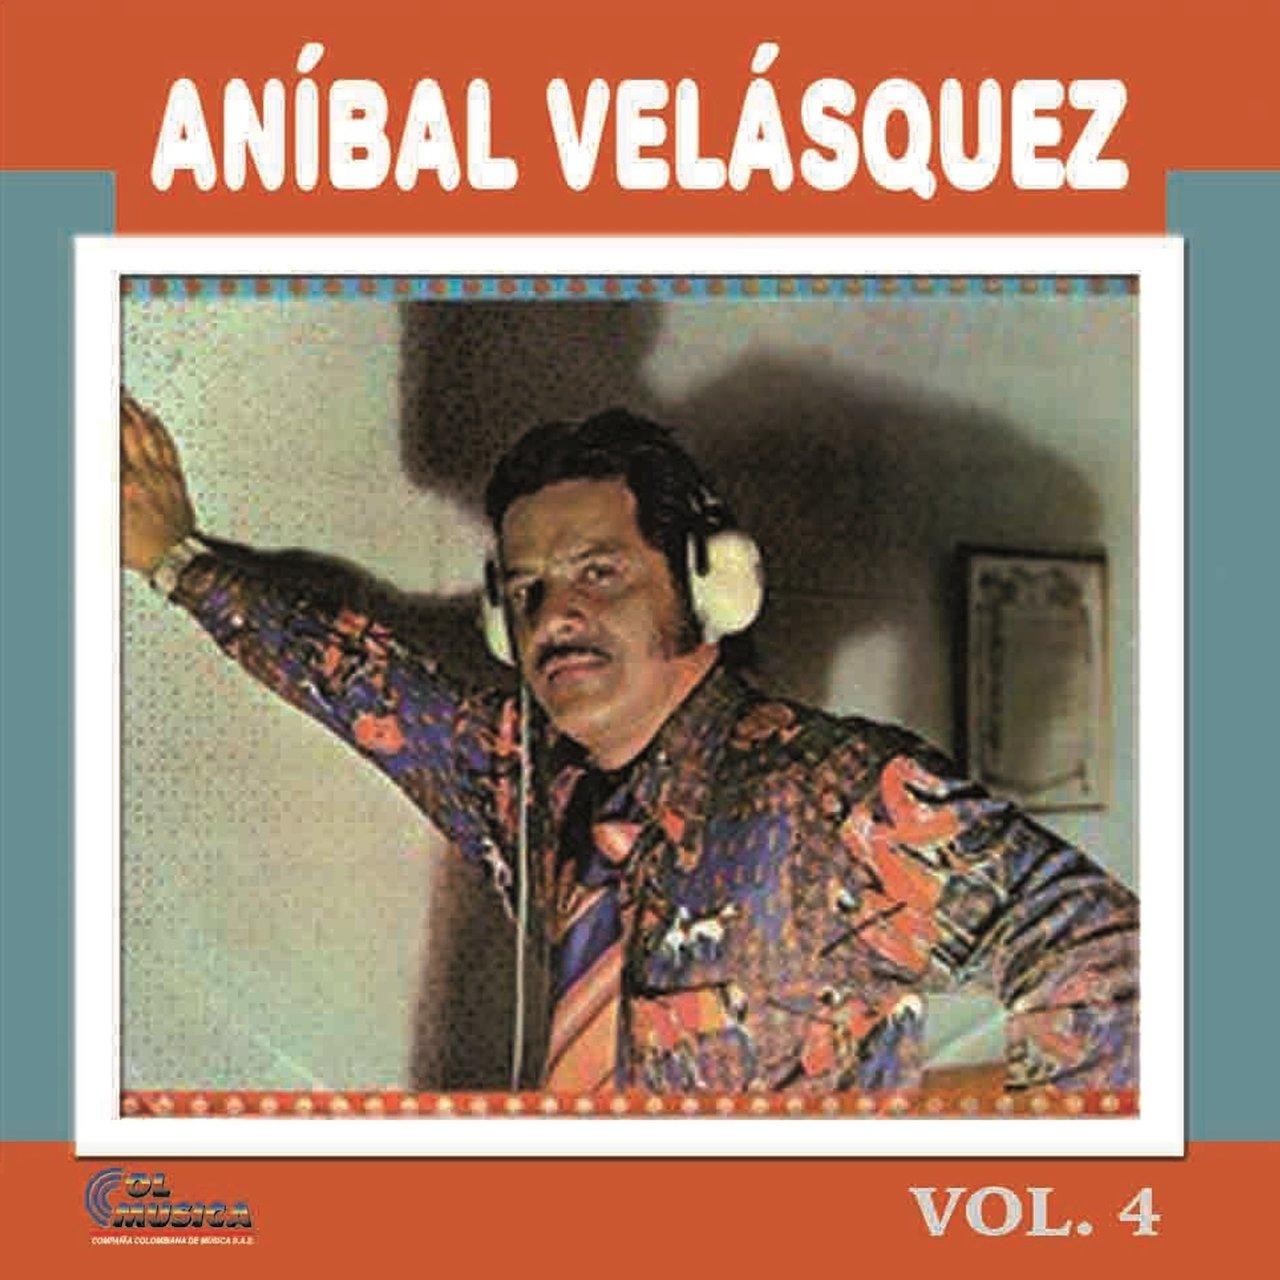 Aníbal Velásquez